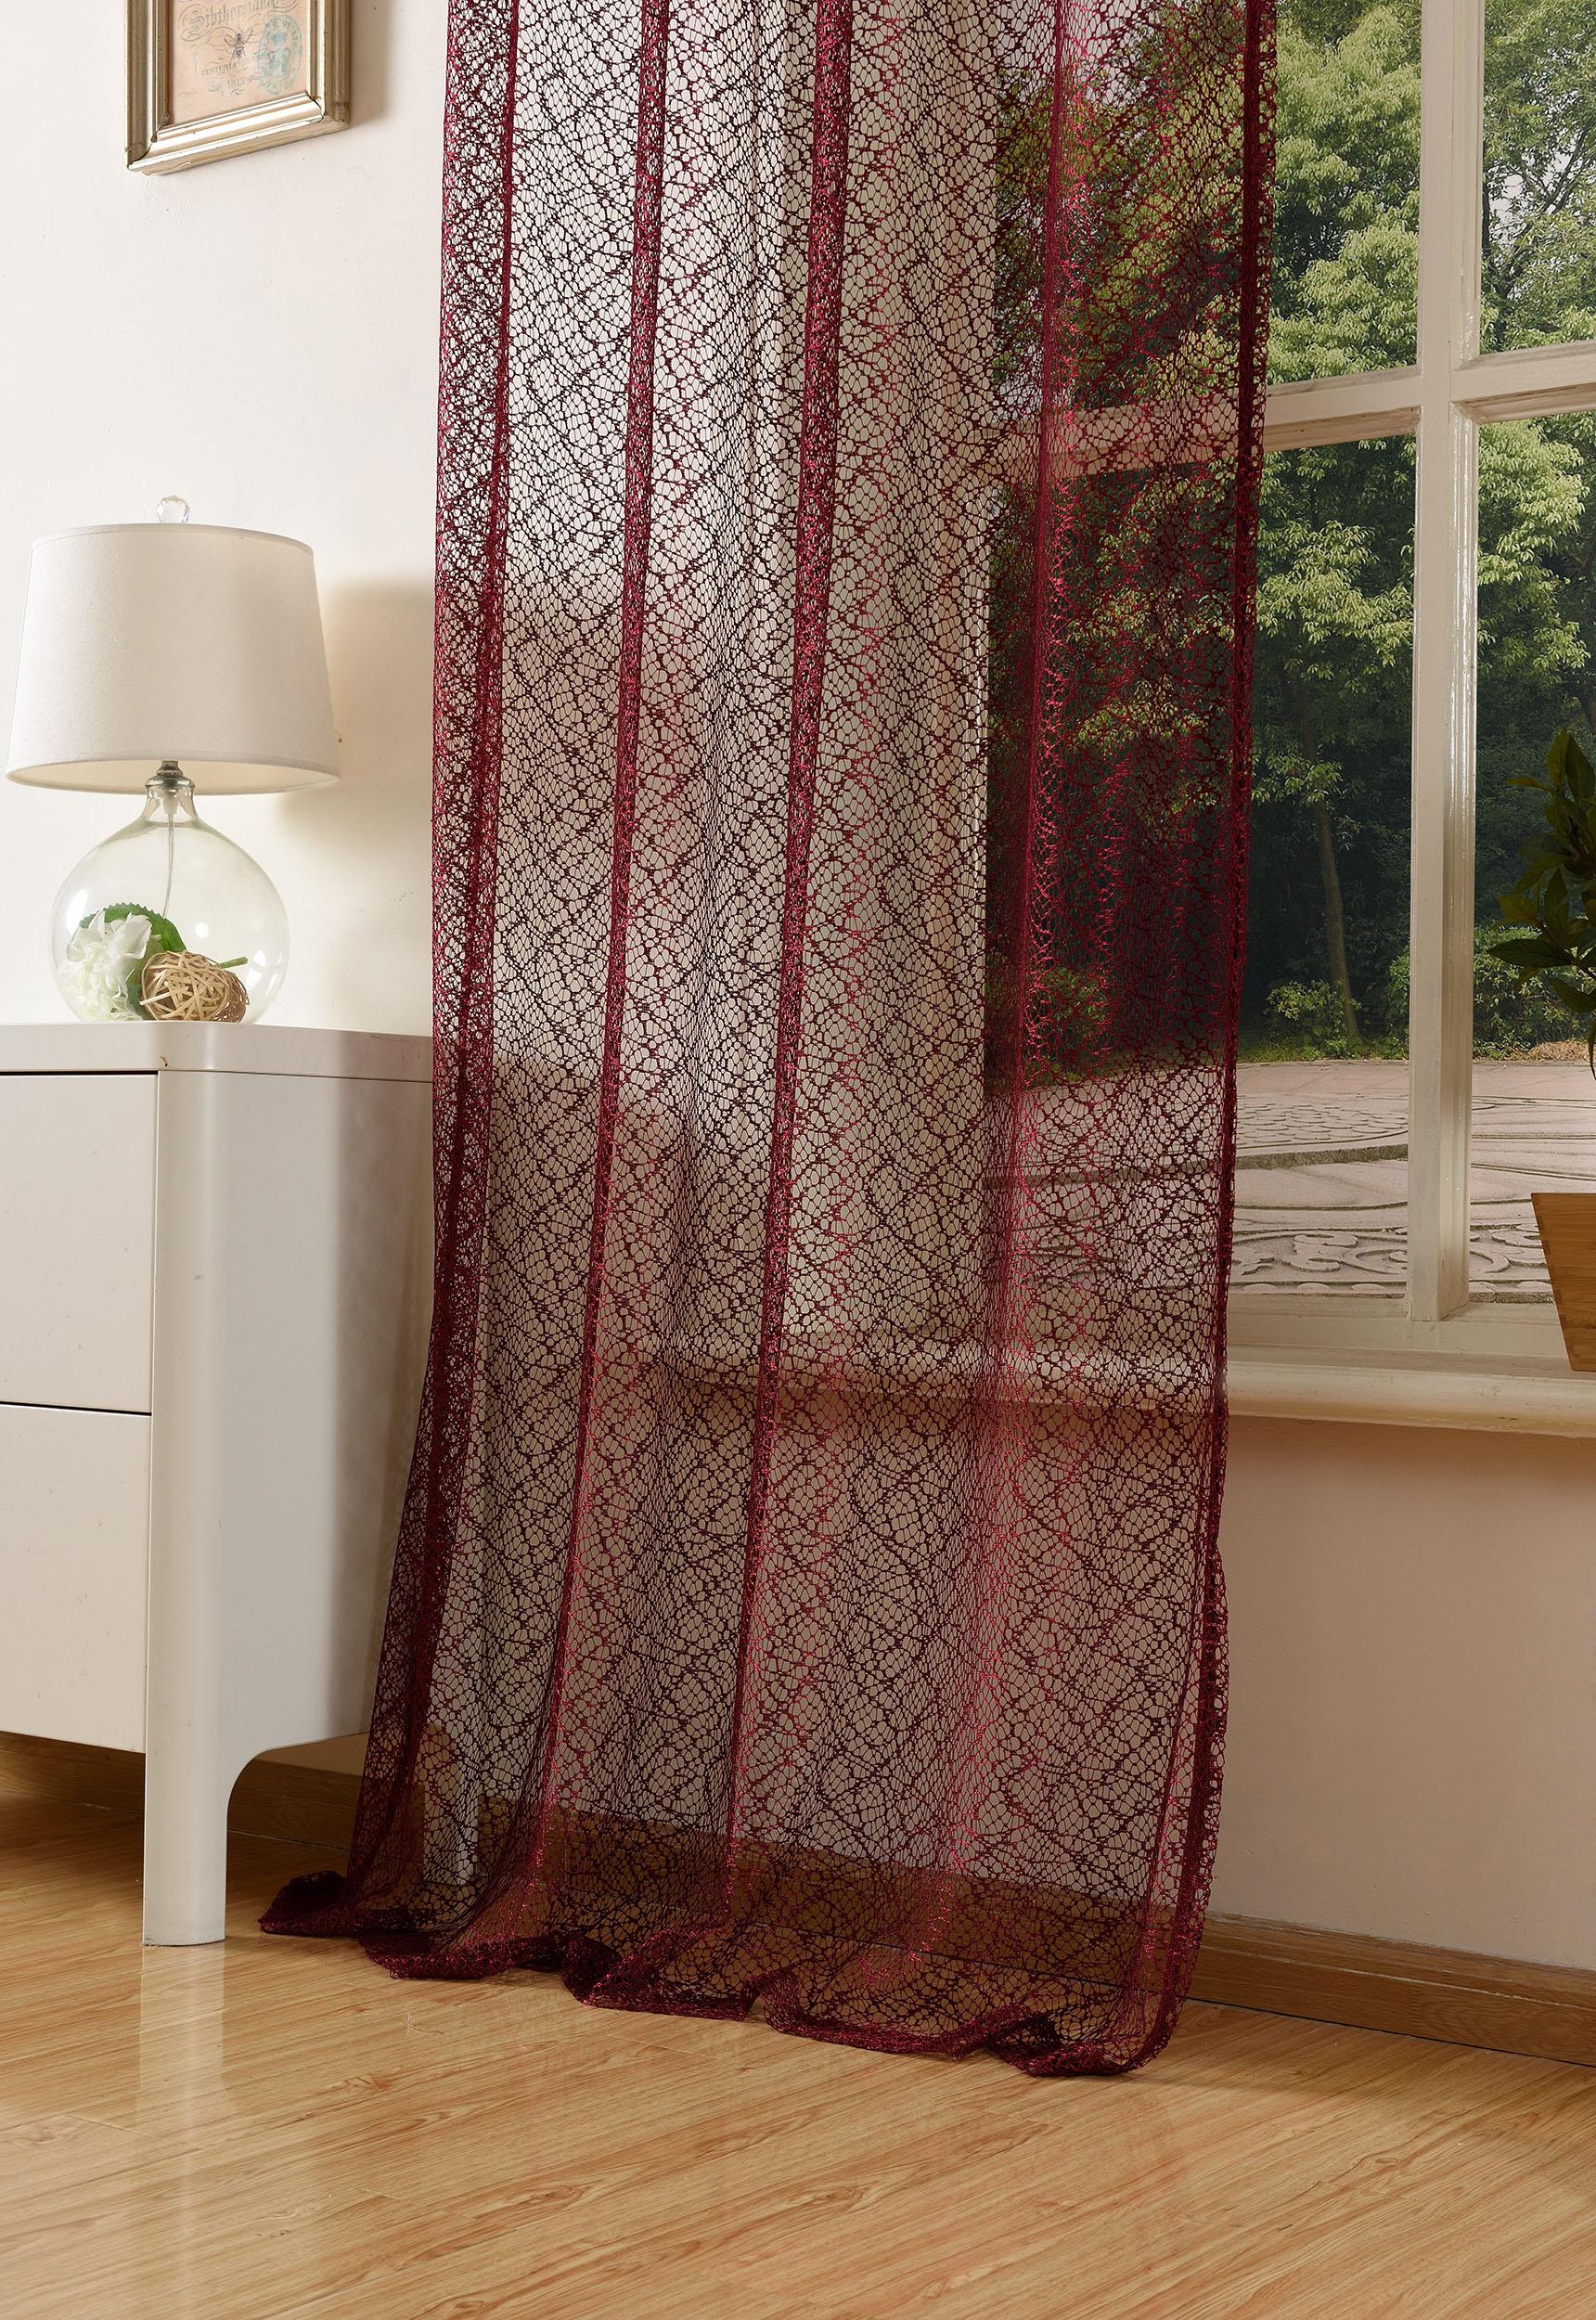 gardine netz struktur mit sen einfarbig transparent 1 st ck 245x140 bordeaux 4041984826787 ebay. Black Bedroom Furniture Sets. Home Design Ideas